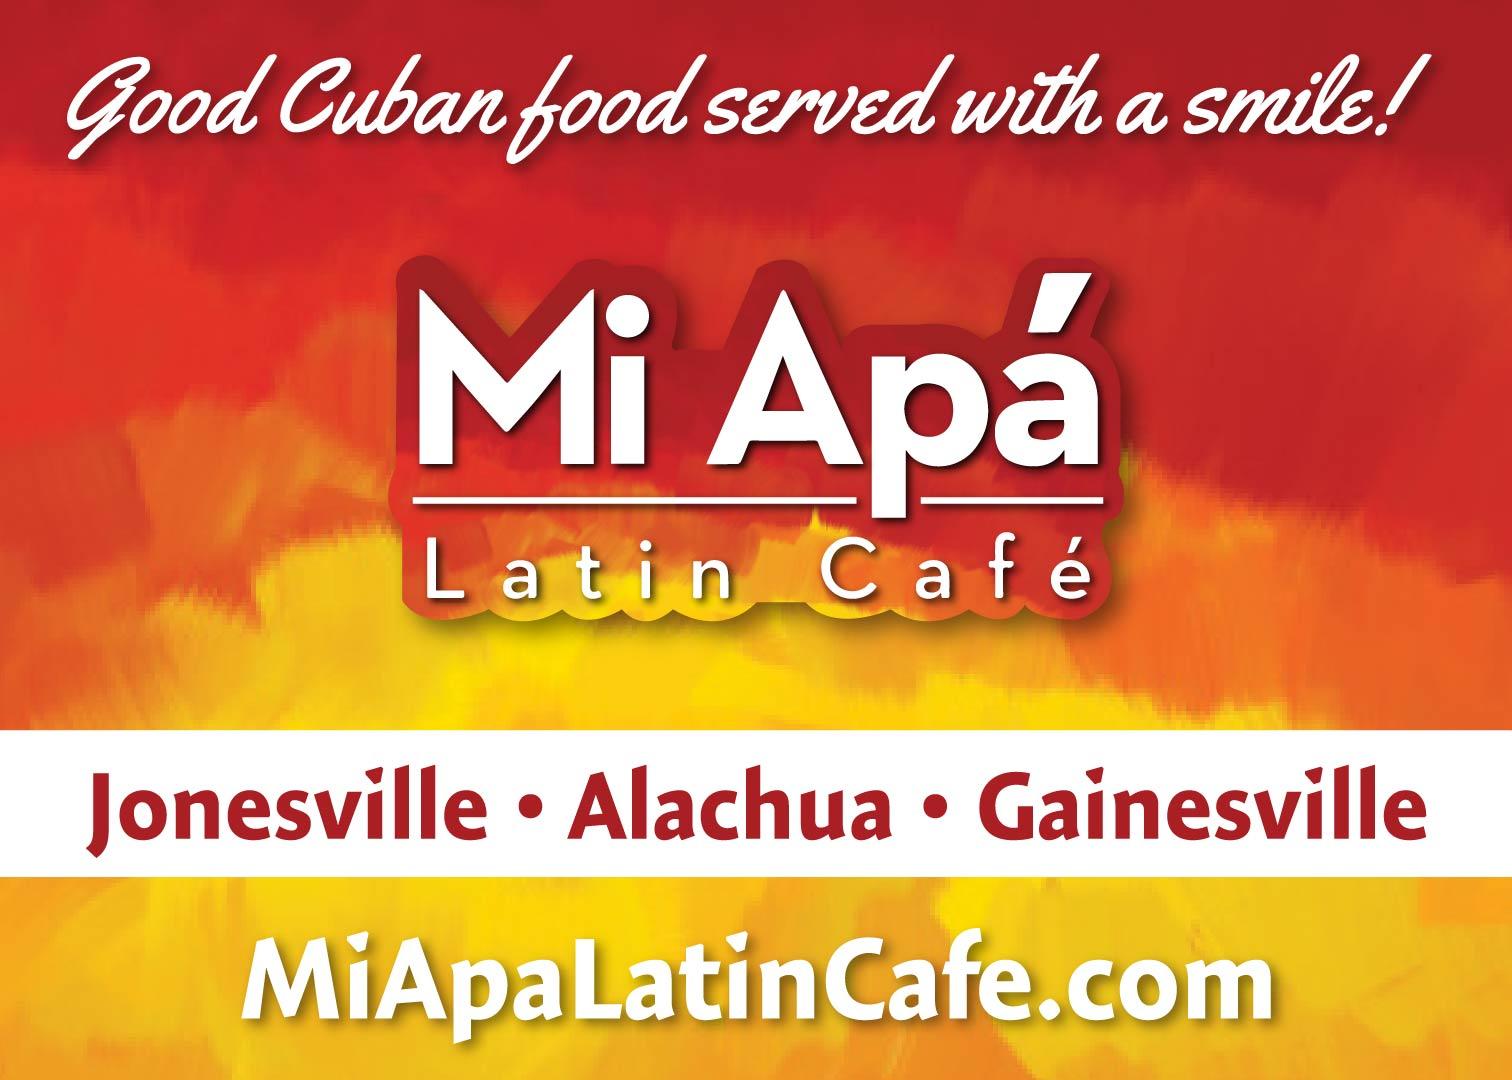 Mi Apá Latin Café